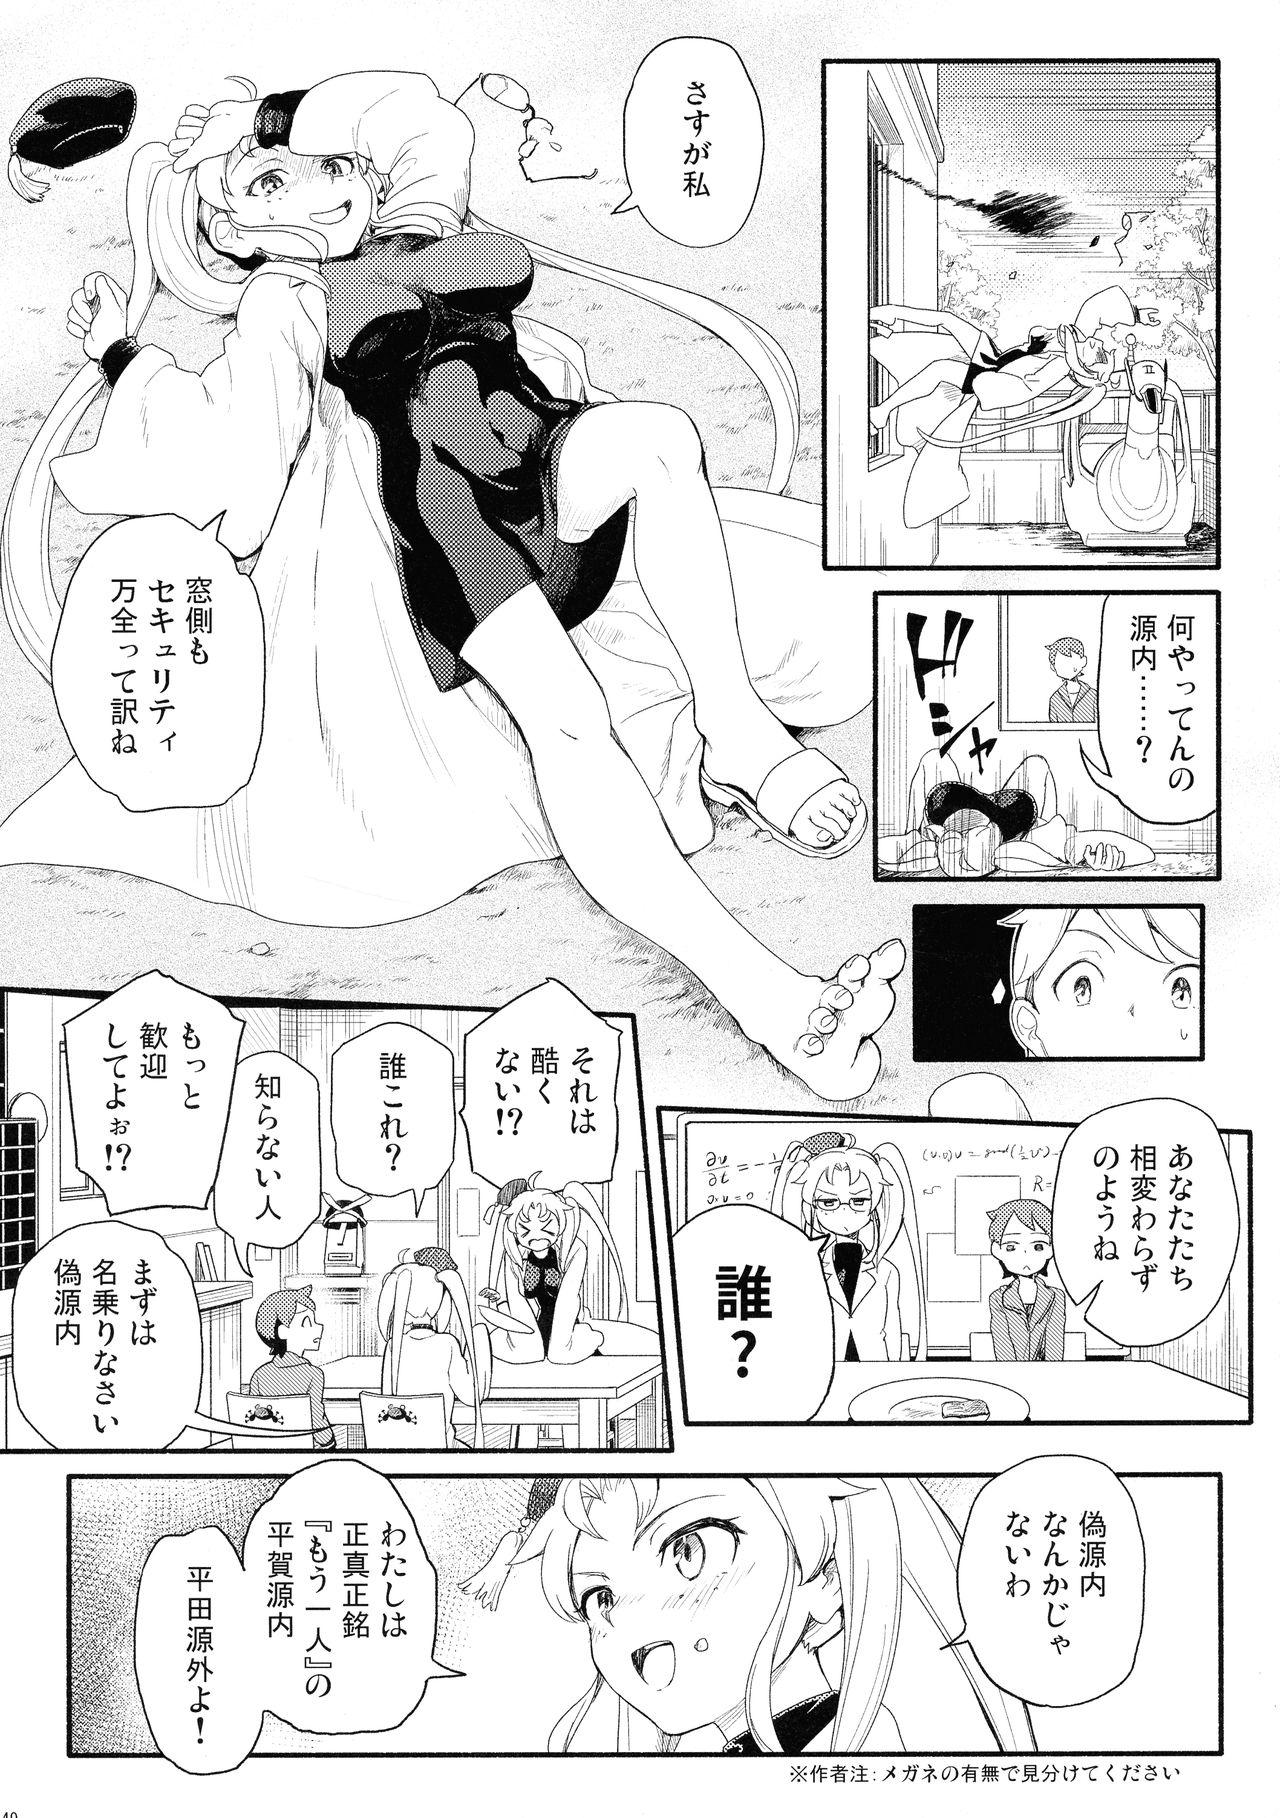 Muhou!! Hiraga Gennai-chan Ecchi Goudoushi 48